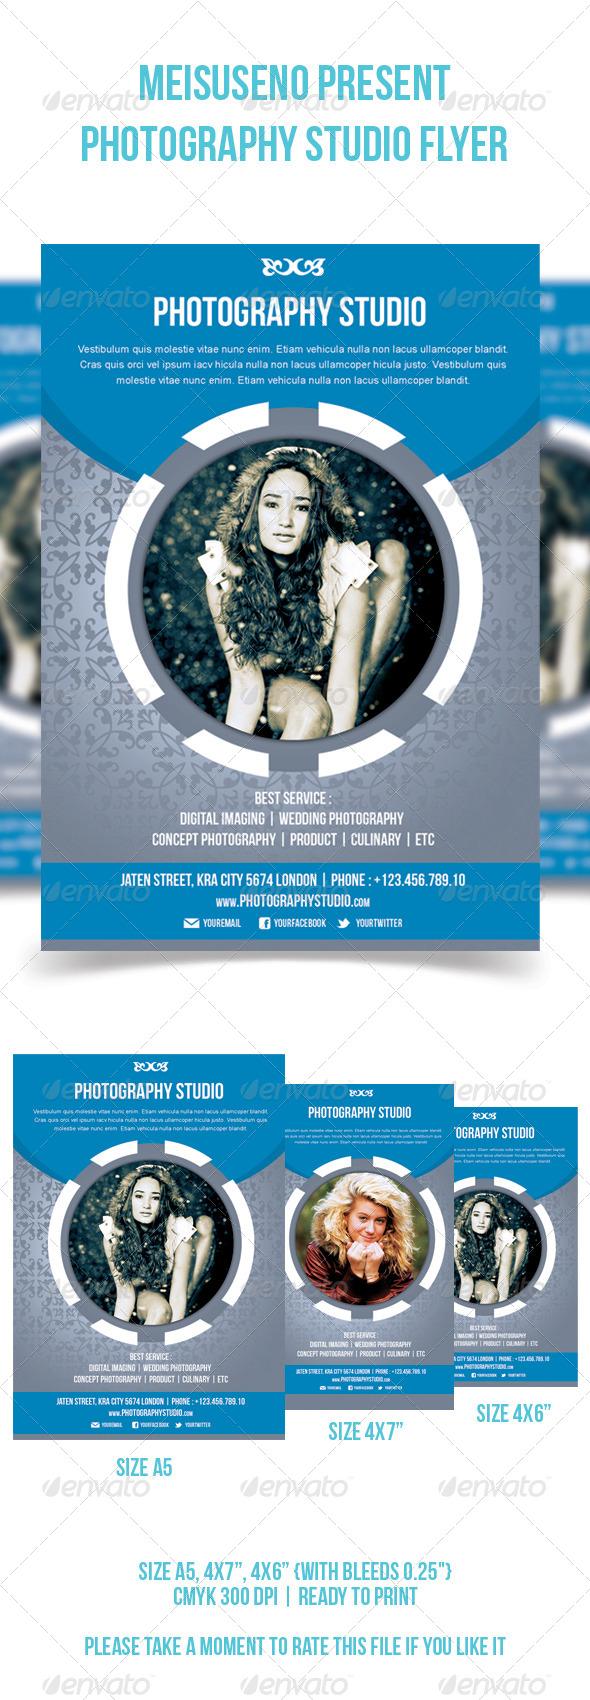 Photography Studio Flyer - V2 - Corporate Flyers